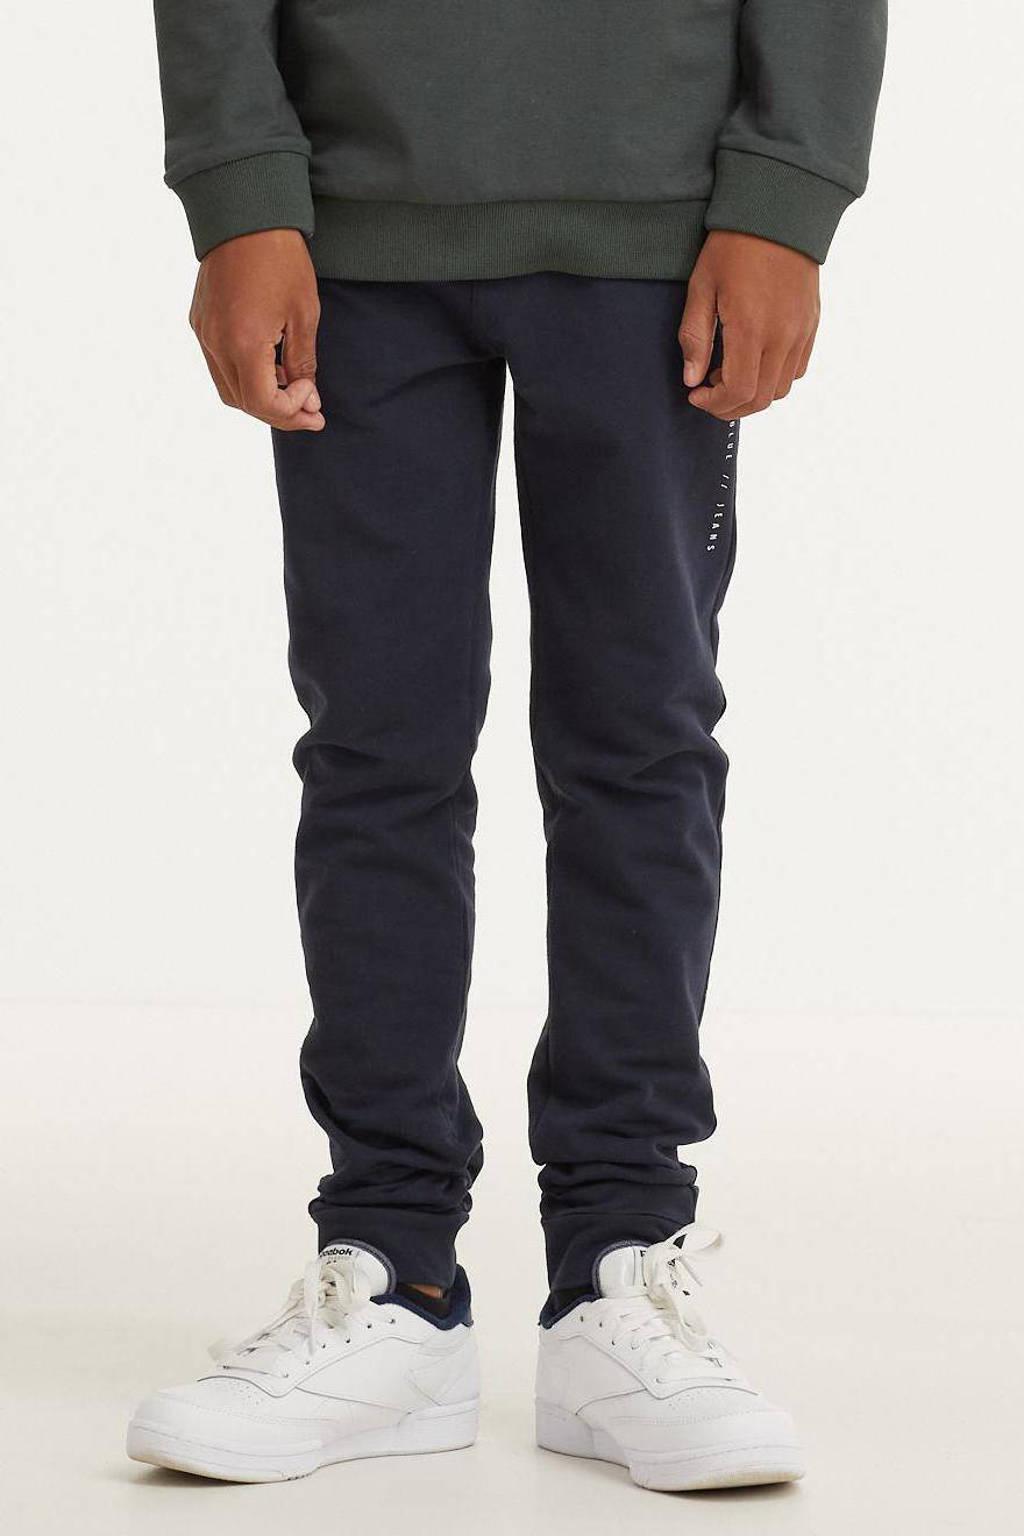 Indian Blue Jeans skinny joggingbroek donkerblauw, Donkerblauw